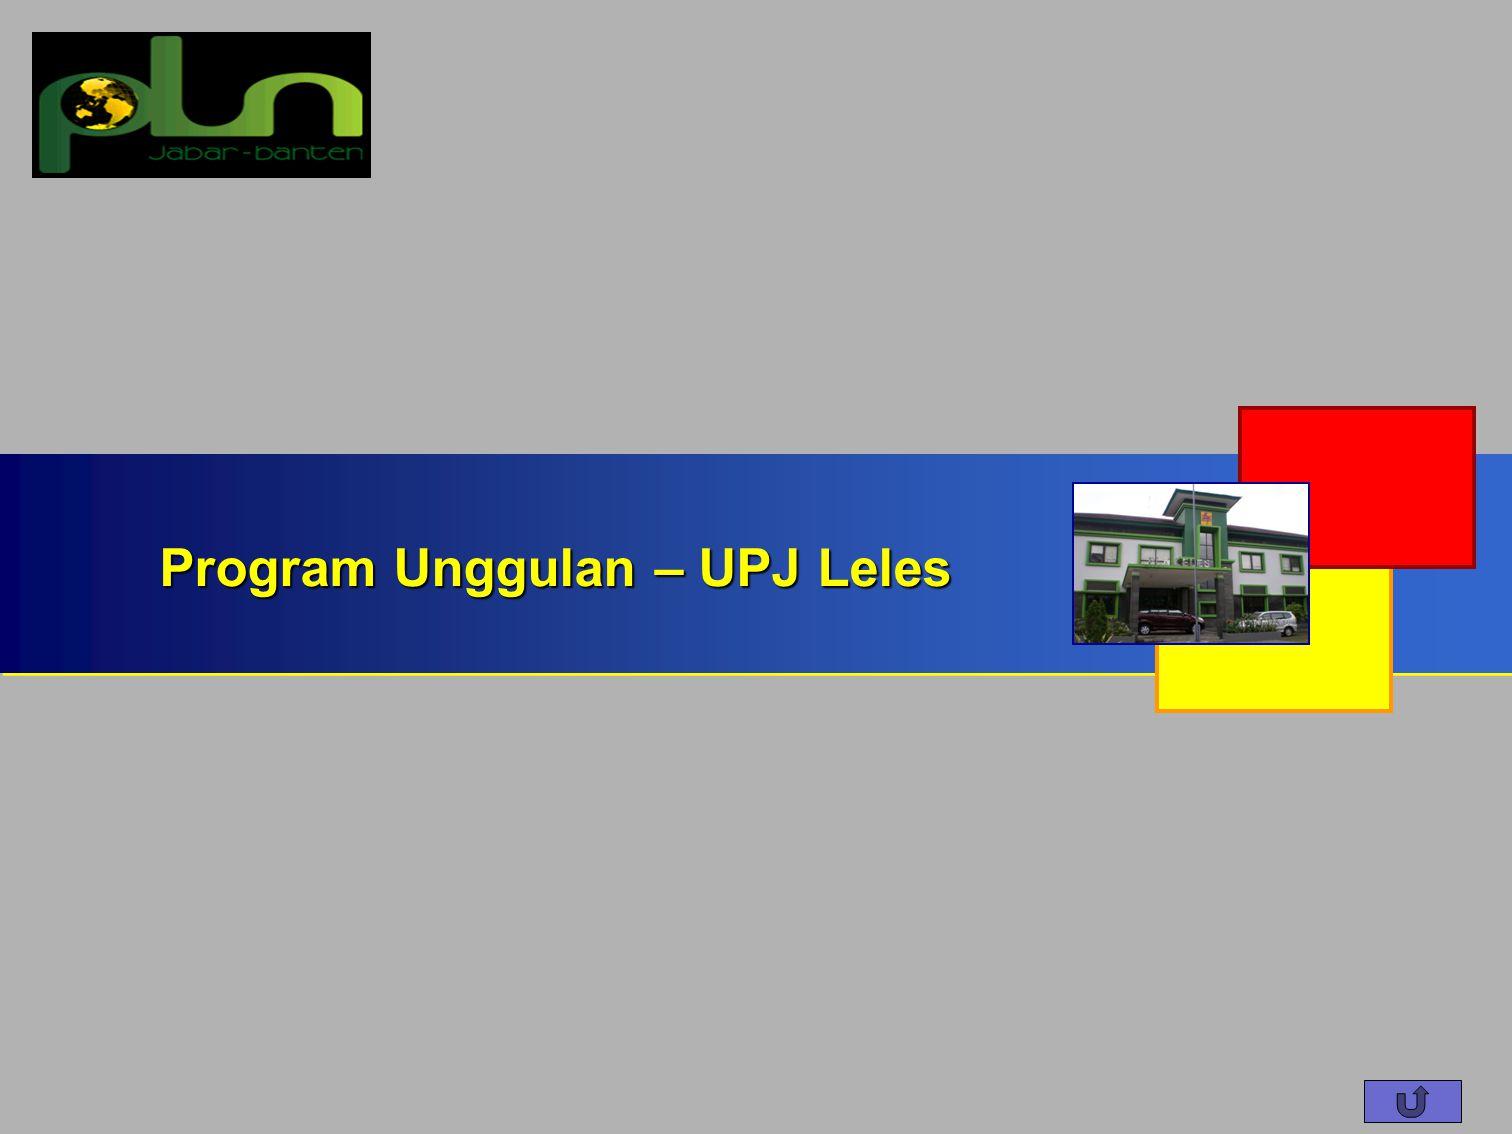 Program Unggulan – UPJ Leles